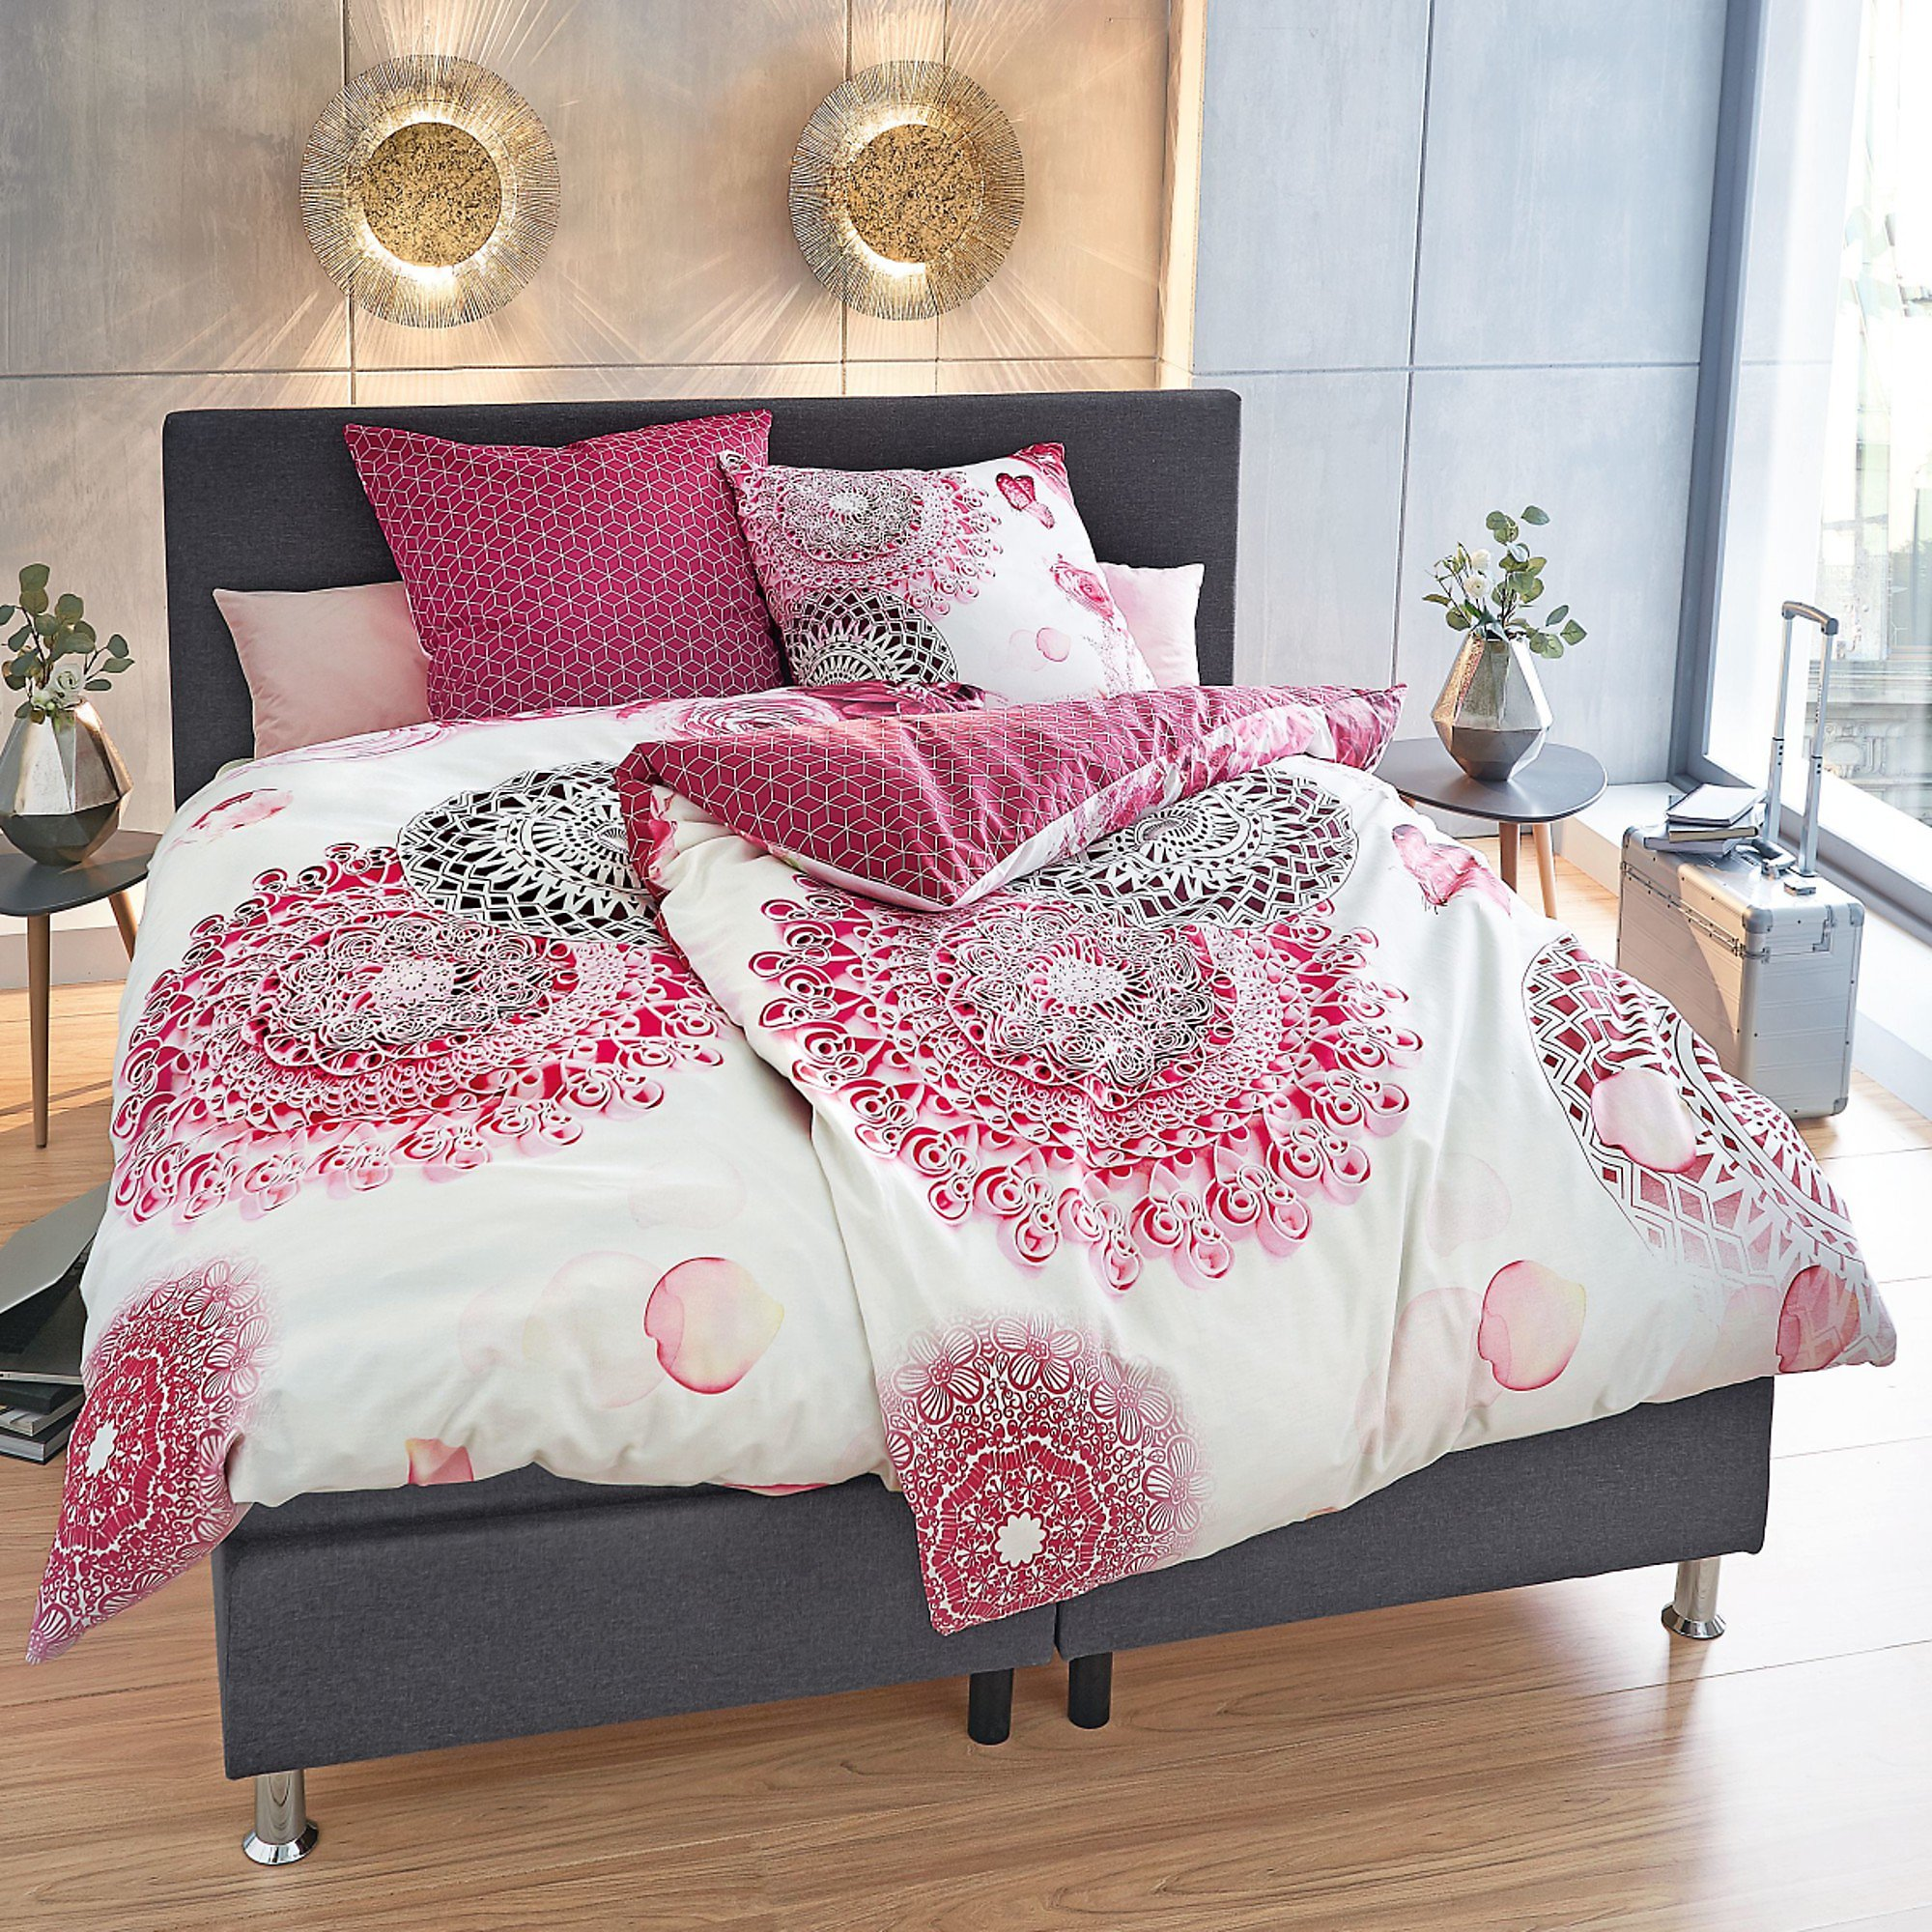 Bettwäsche Jacky Rot Weiß 135 X 200 Cm Bestellen Weltbildat